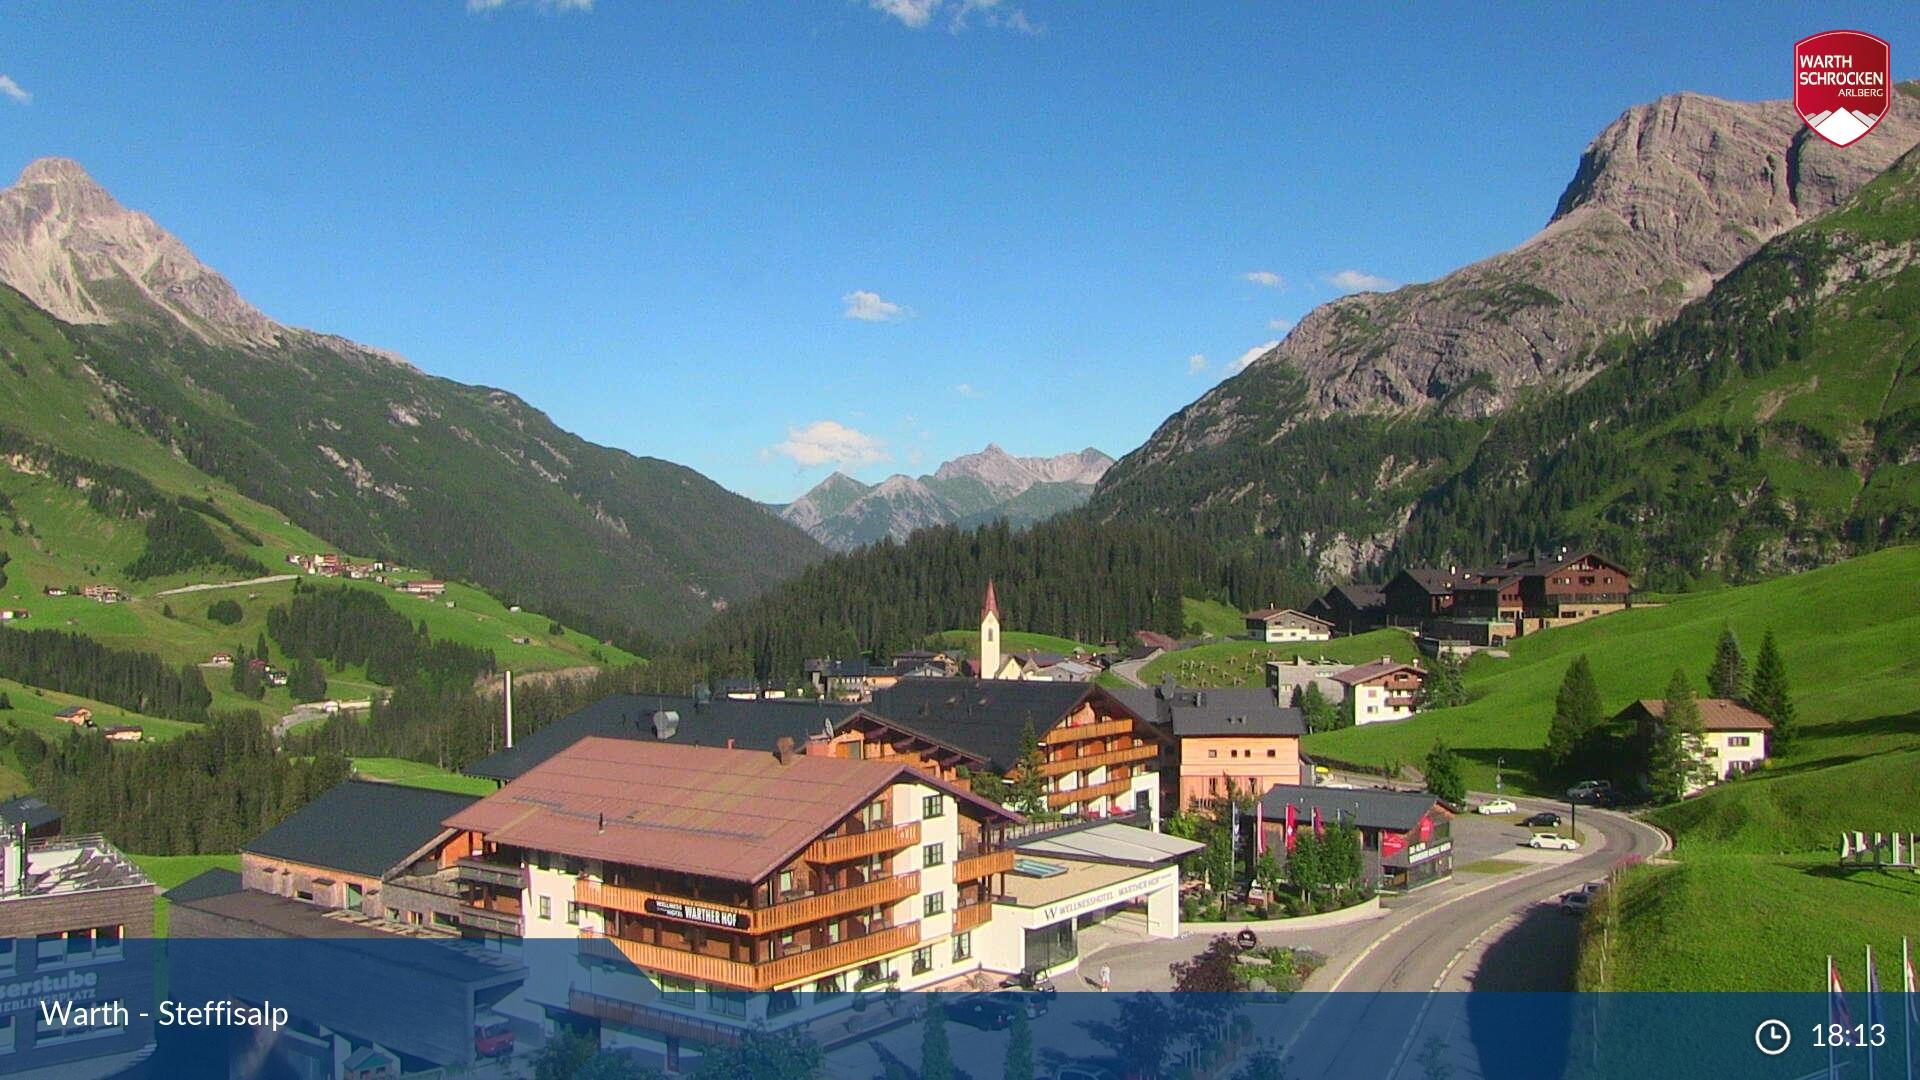 Ski Arlberg - Warth webcam - Steffisalp